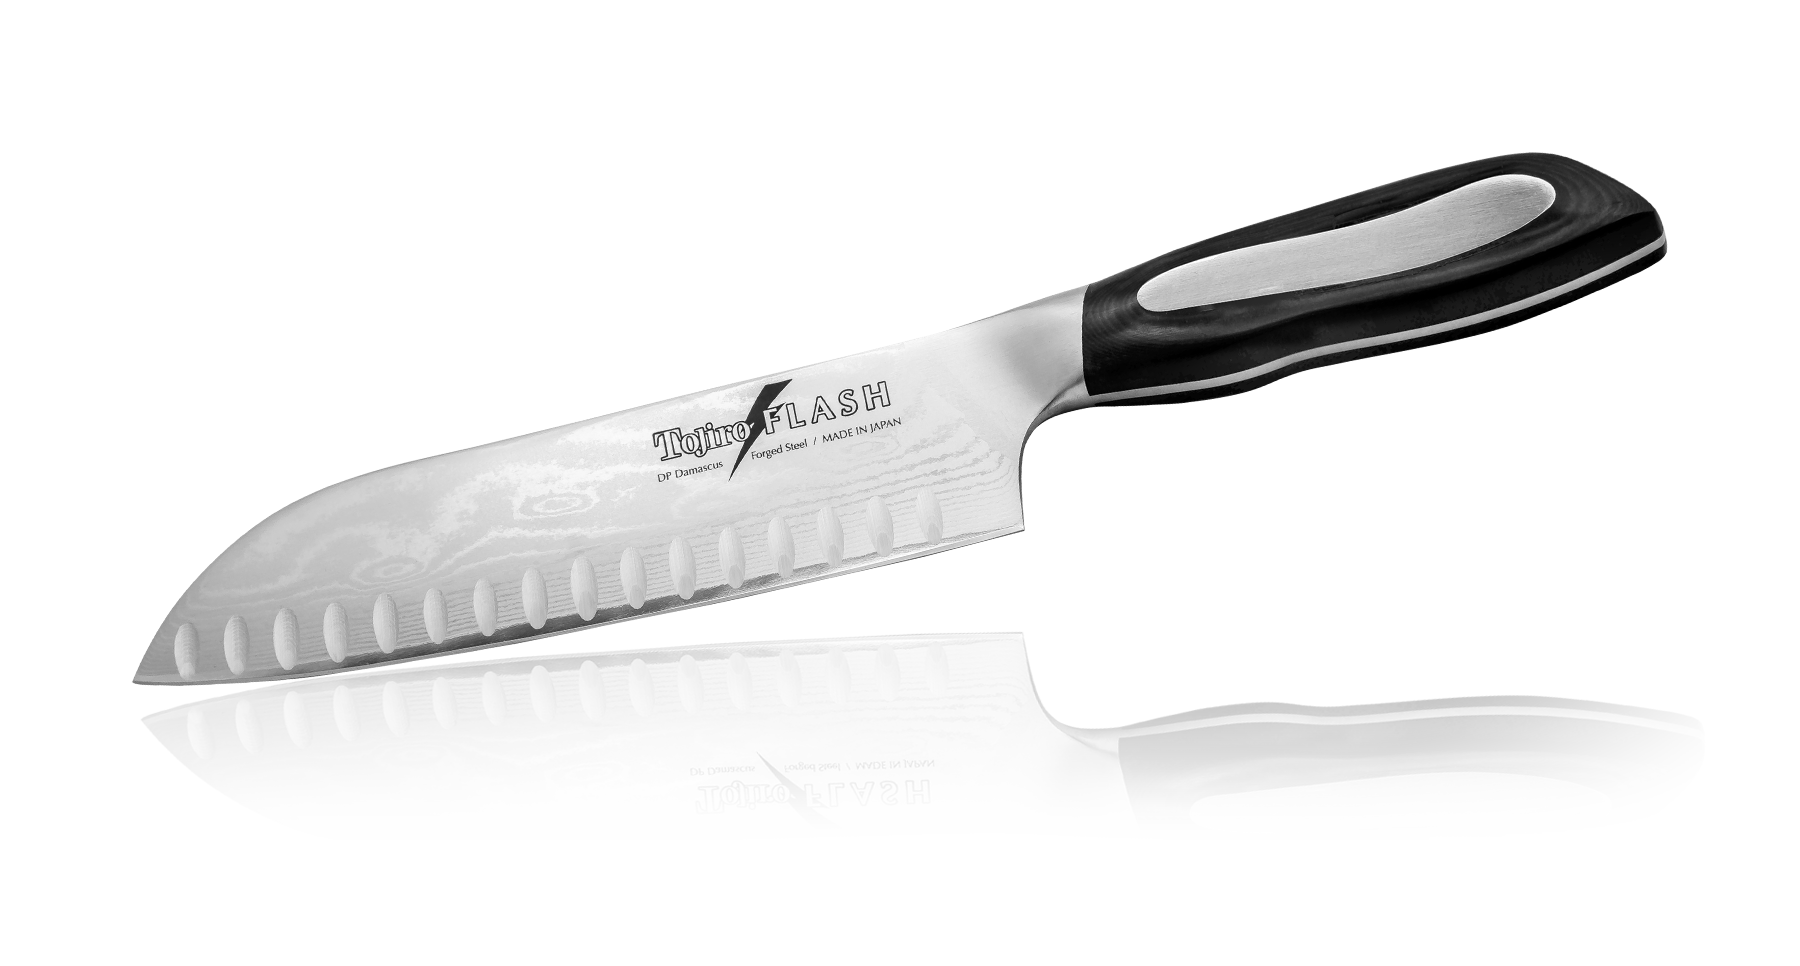 Нож Сантоку Tojiro Flash 180 мм с насечками, сталь VG-10 цены